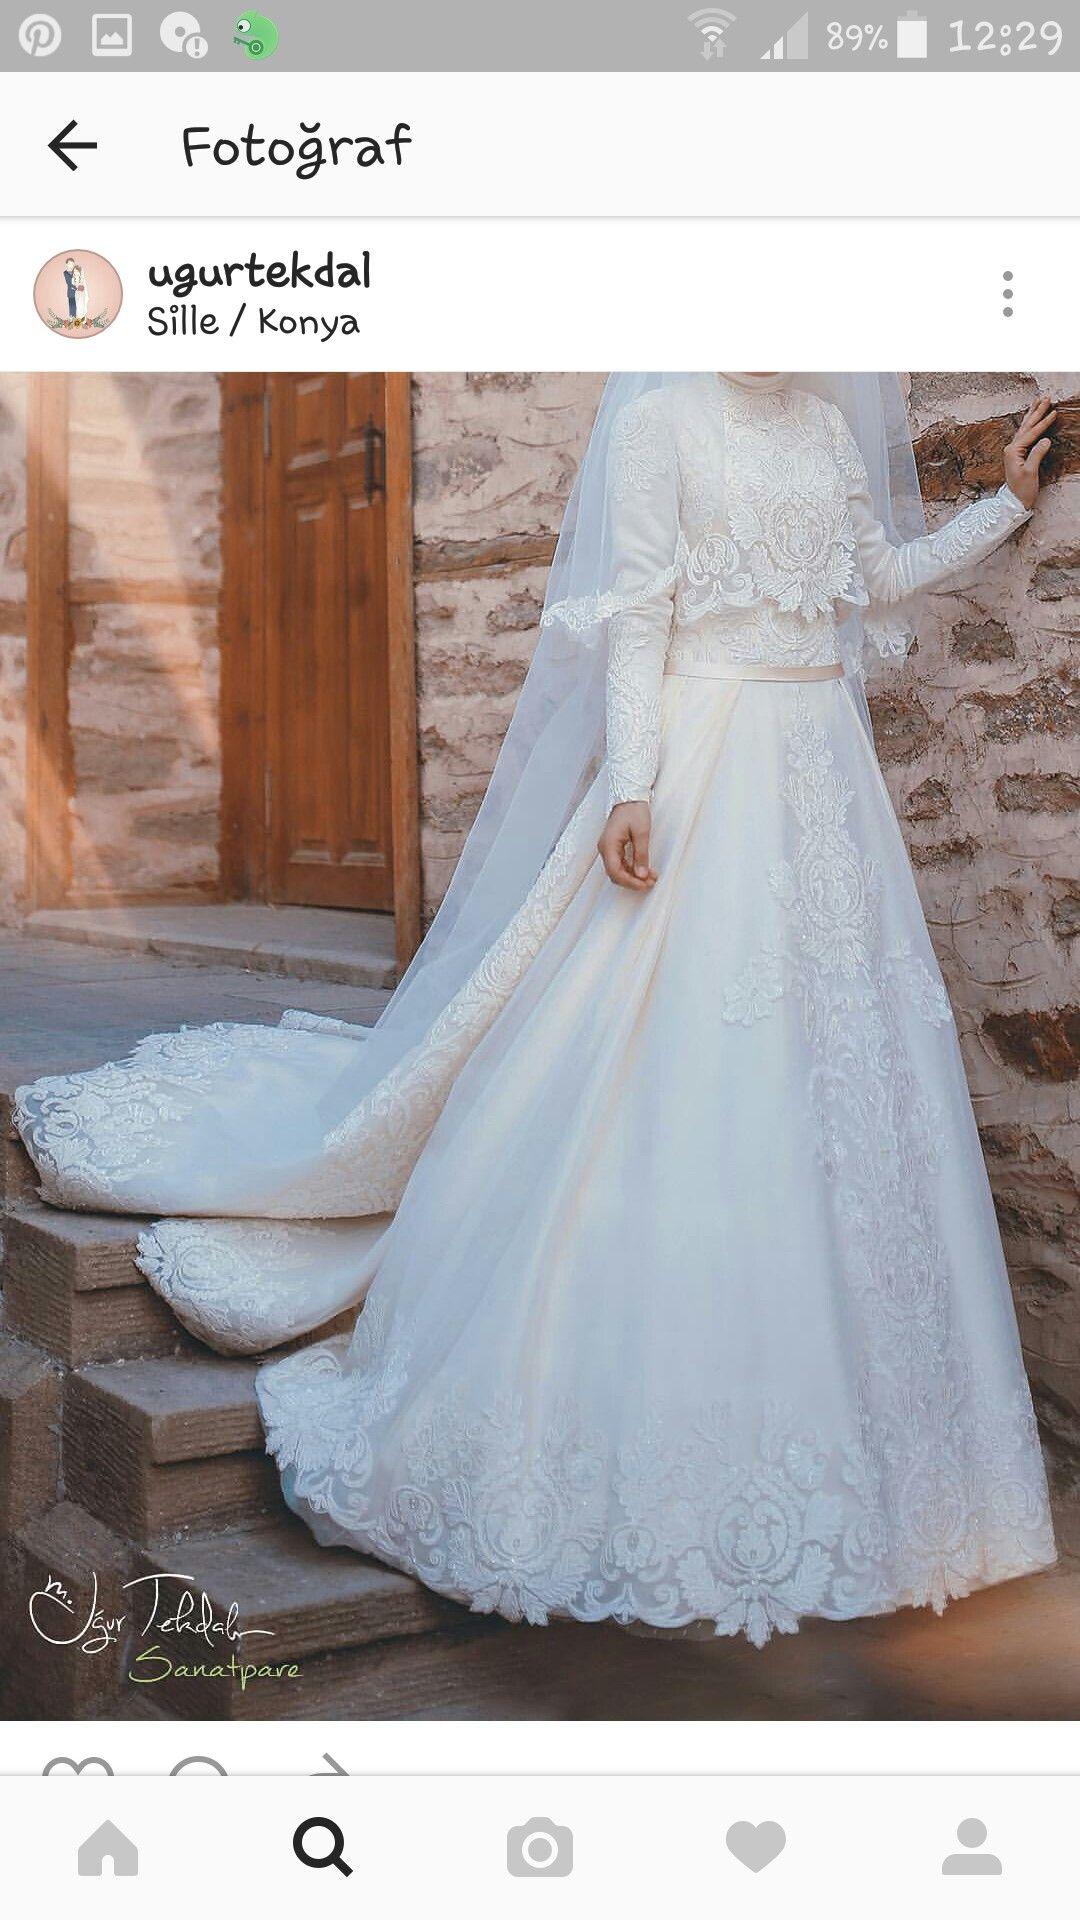 Favorim | Hijab wedding style | Pinterest | Wedding dress, Wedding ...